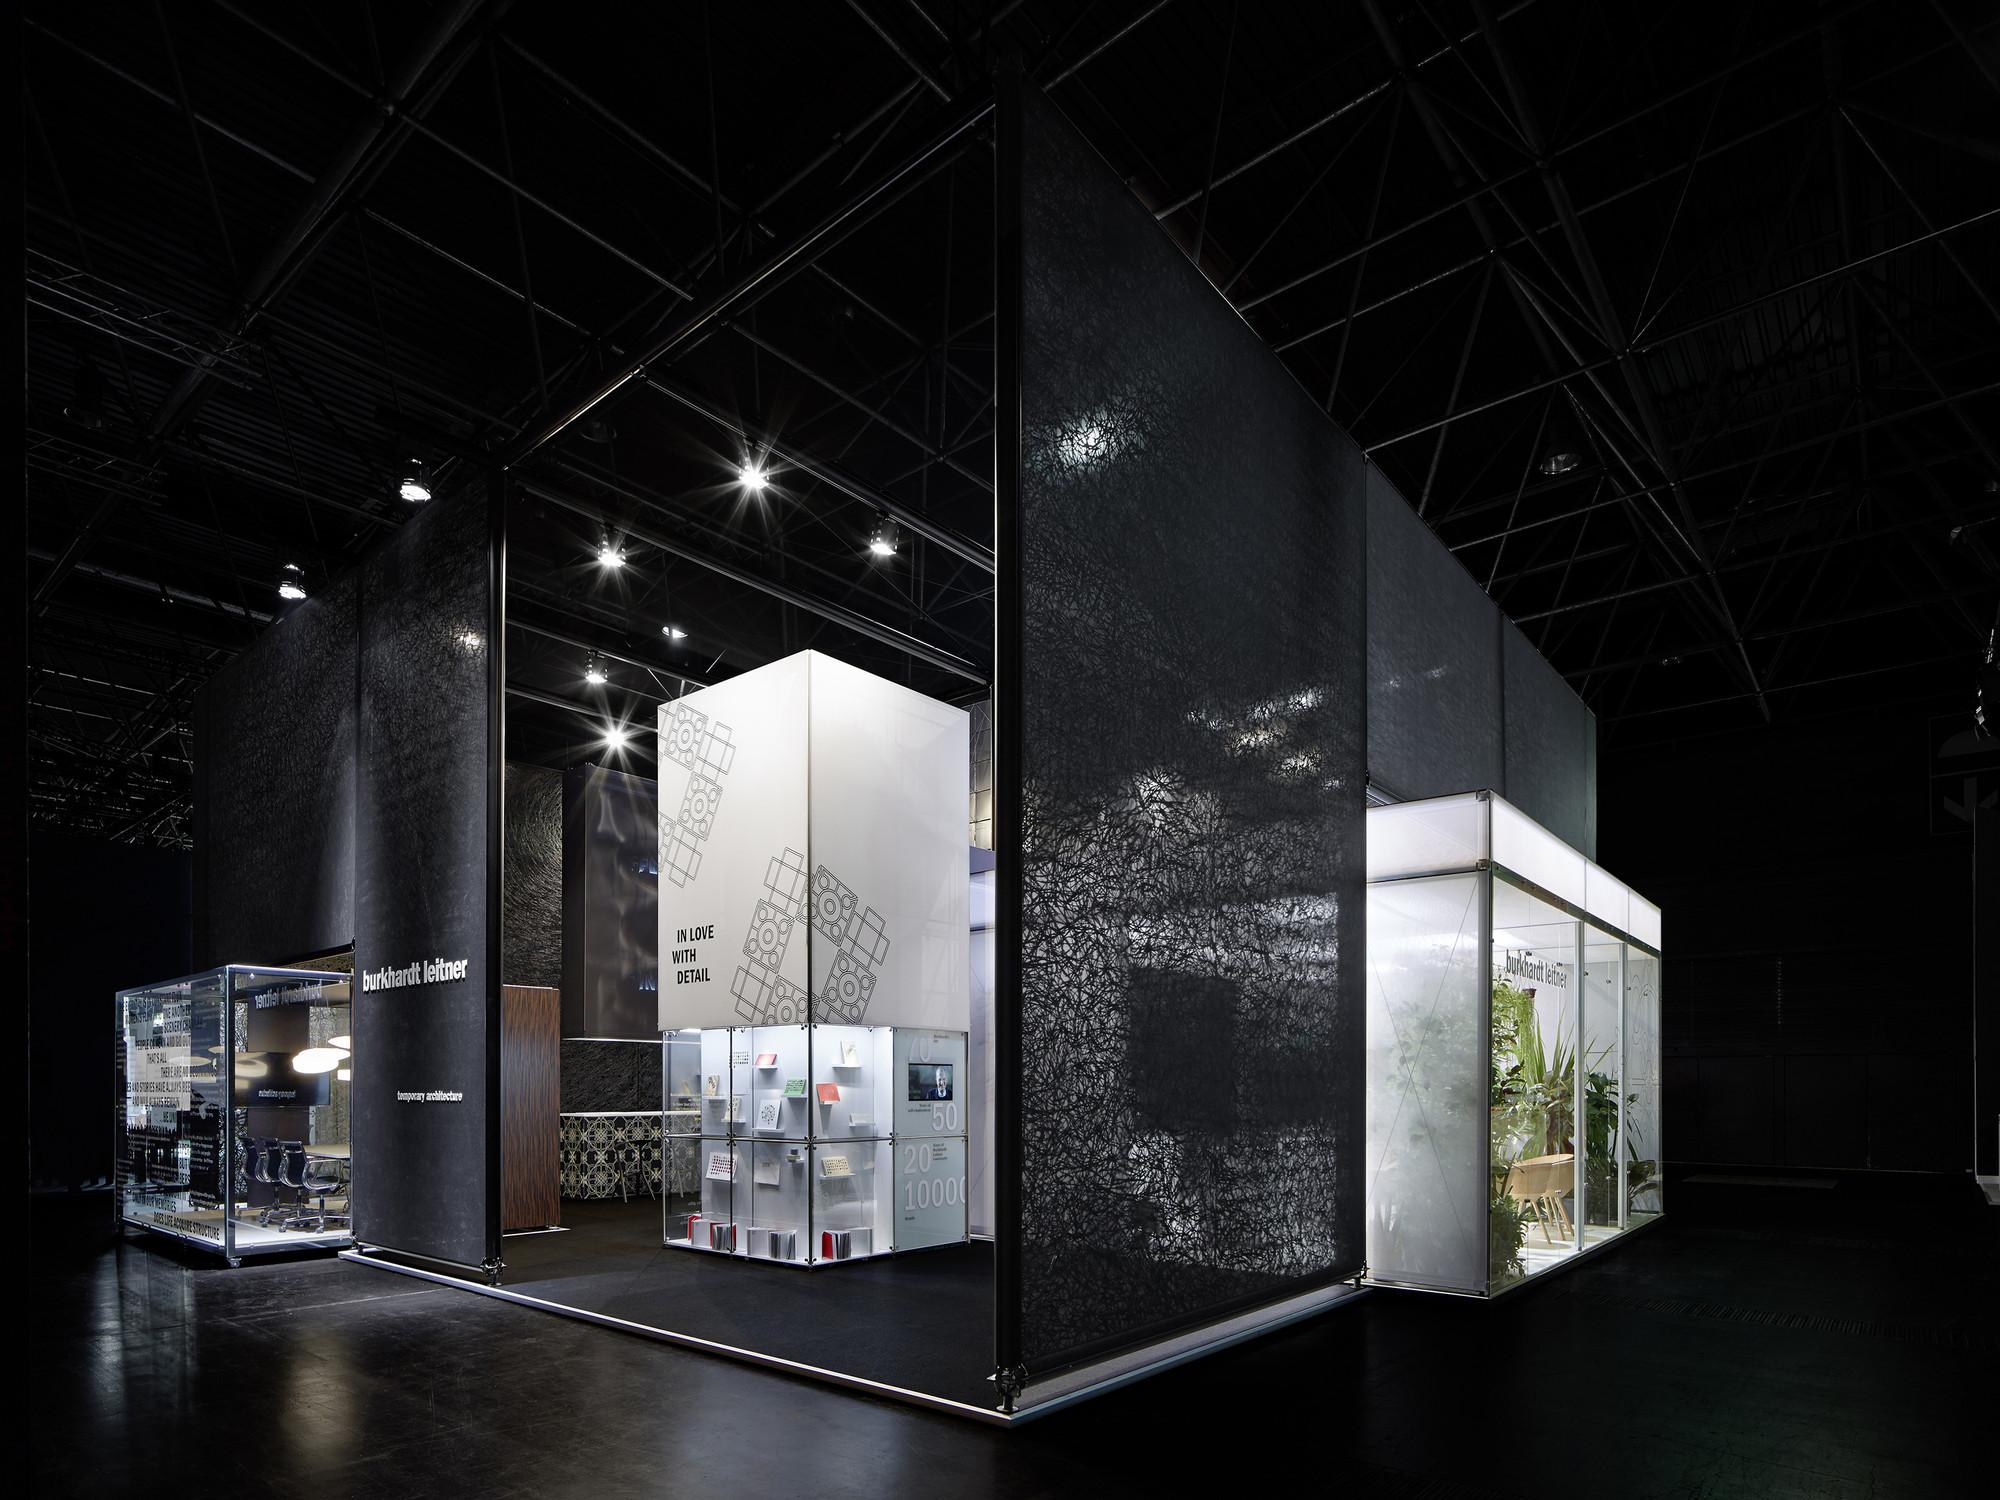 Burkhardt Leitner constructiv exhibition  / Ippolito Fleitz Group , © Zooey Braun